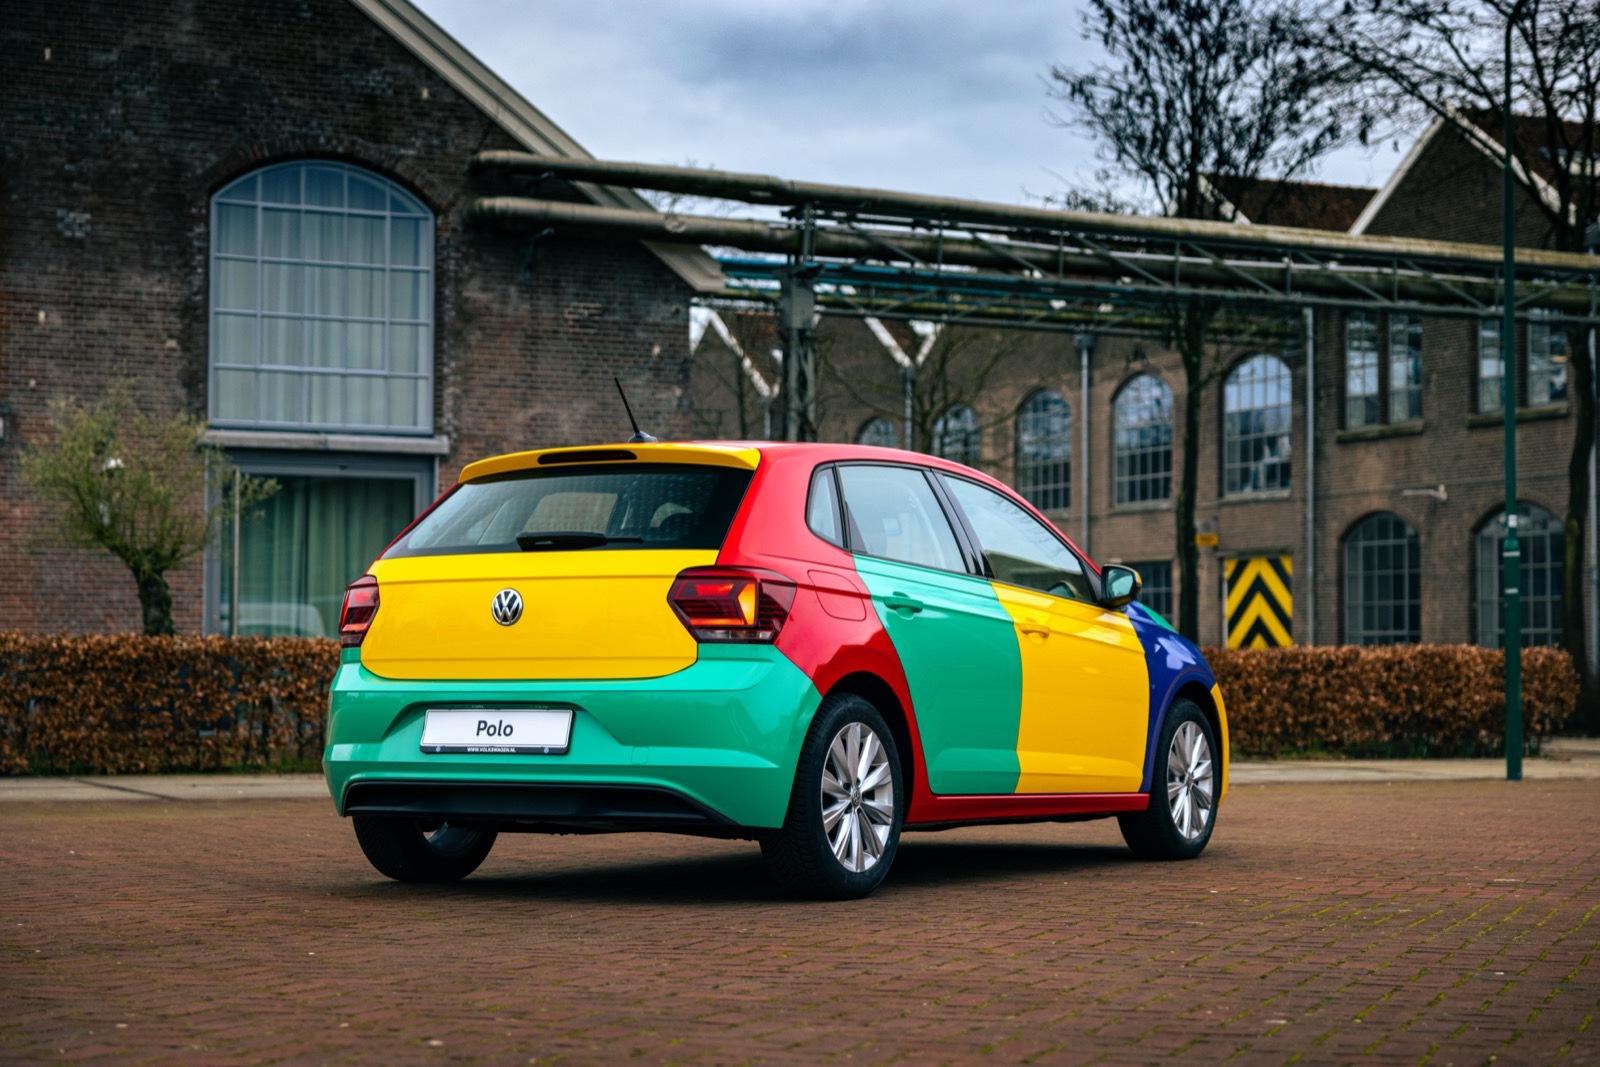 Volkswagen_Netherlands_modern_Polo_Harlekin_0018